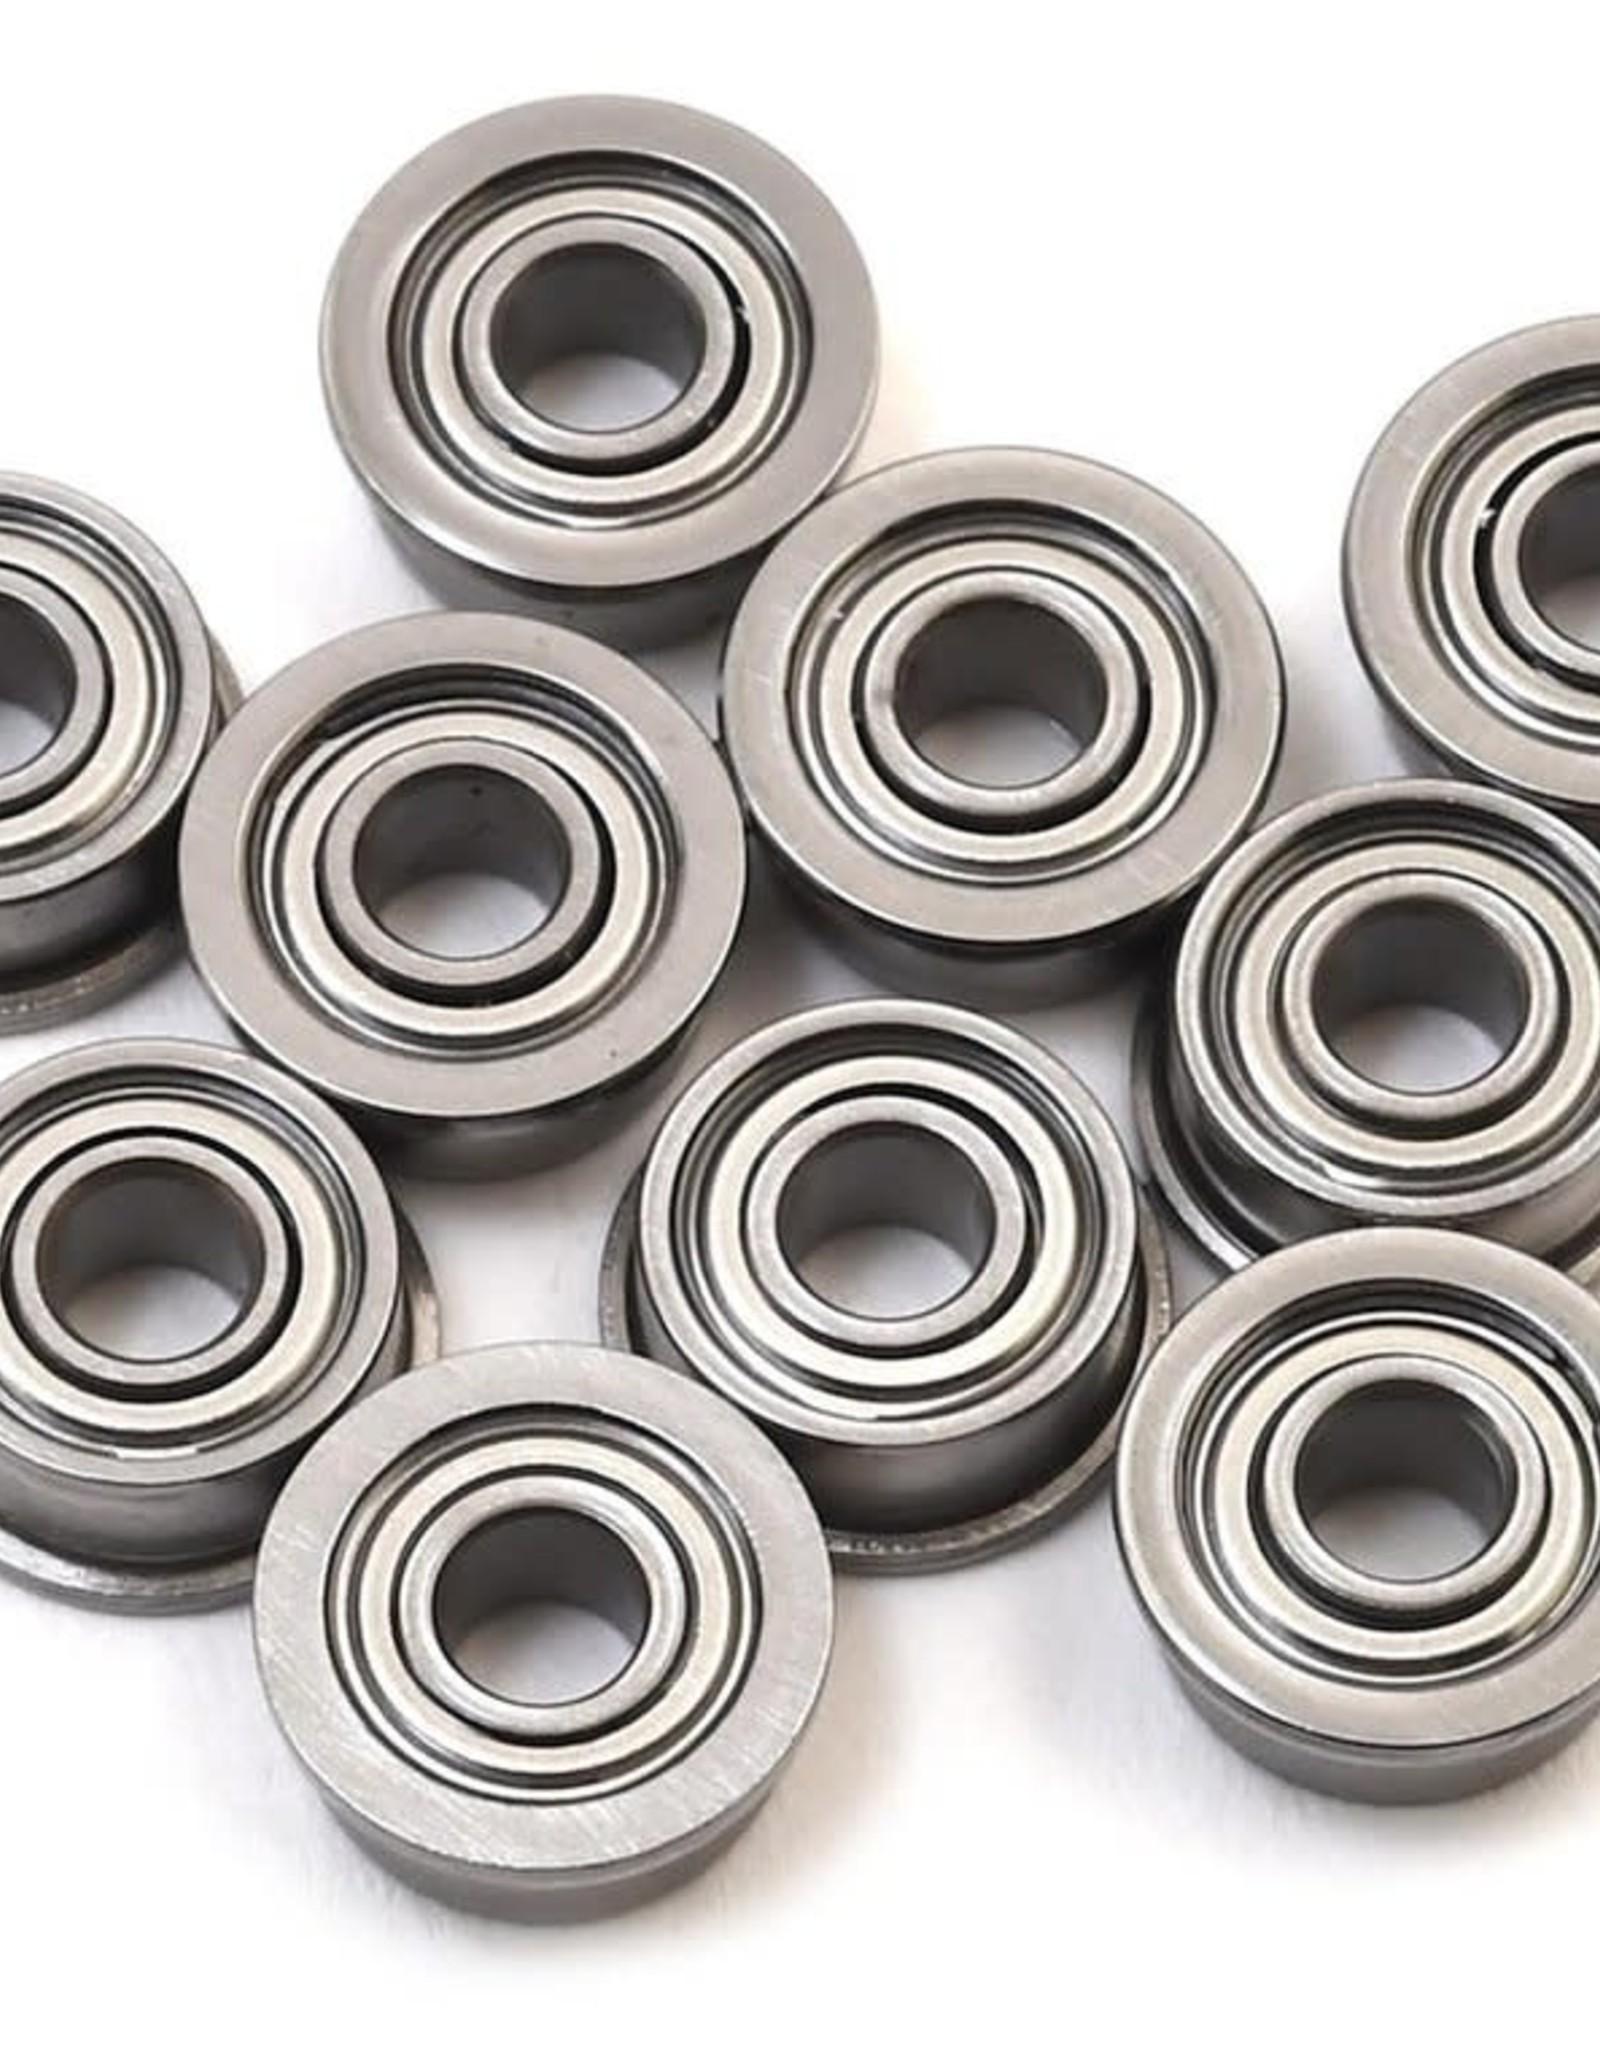 CRC CRC 1/8 x 5/16 Flanged Bearings (10)